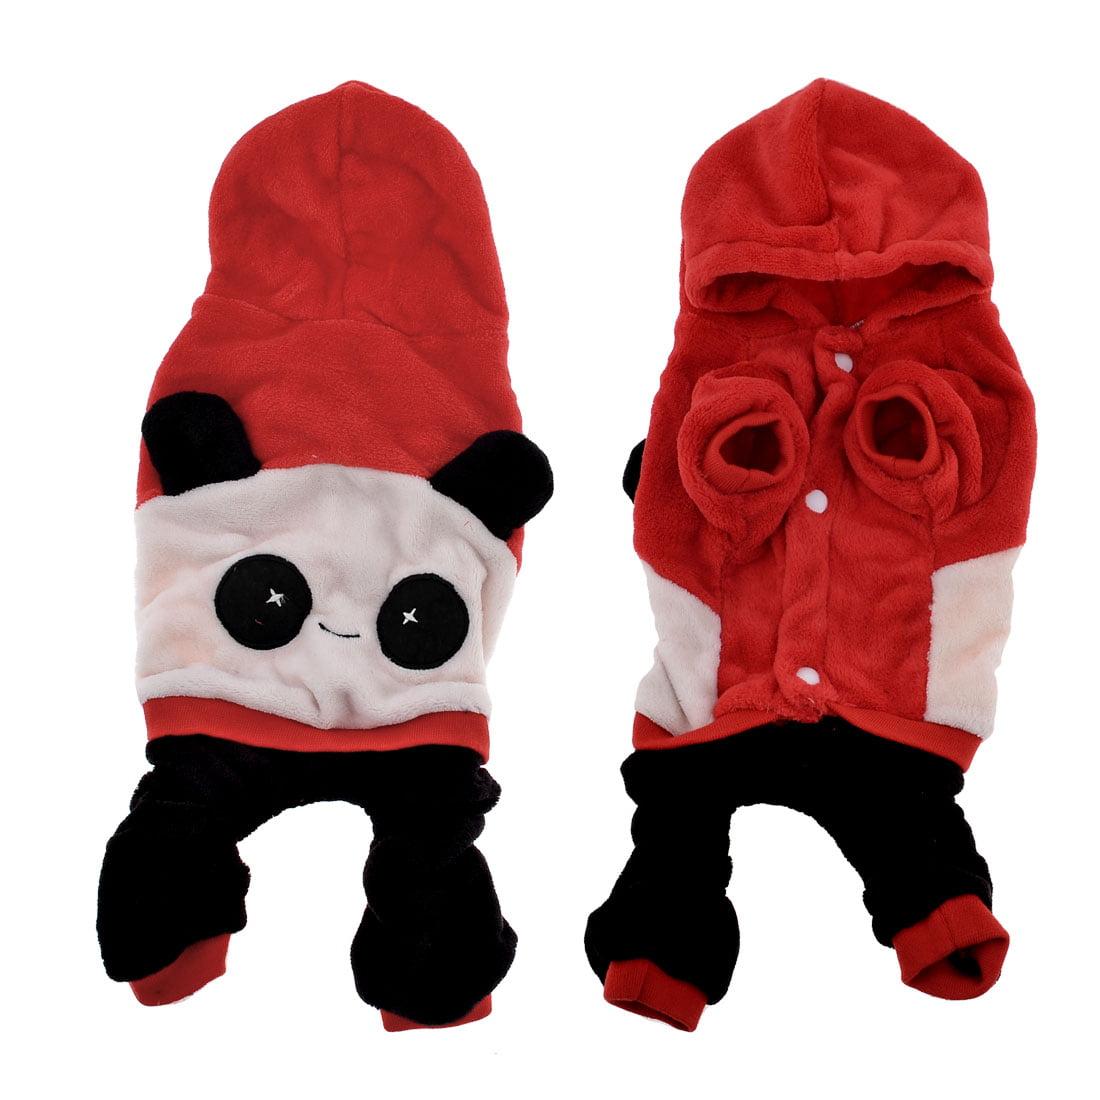 Warm Plush Panda Shape Chihuahua Pet Dog Cat Apparel Clothes Jumpsuit Red XL